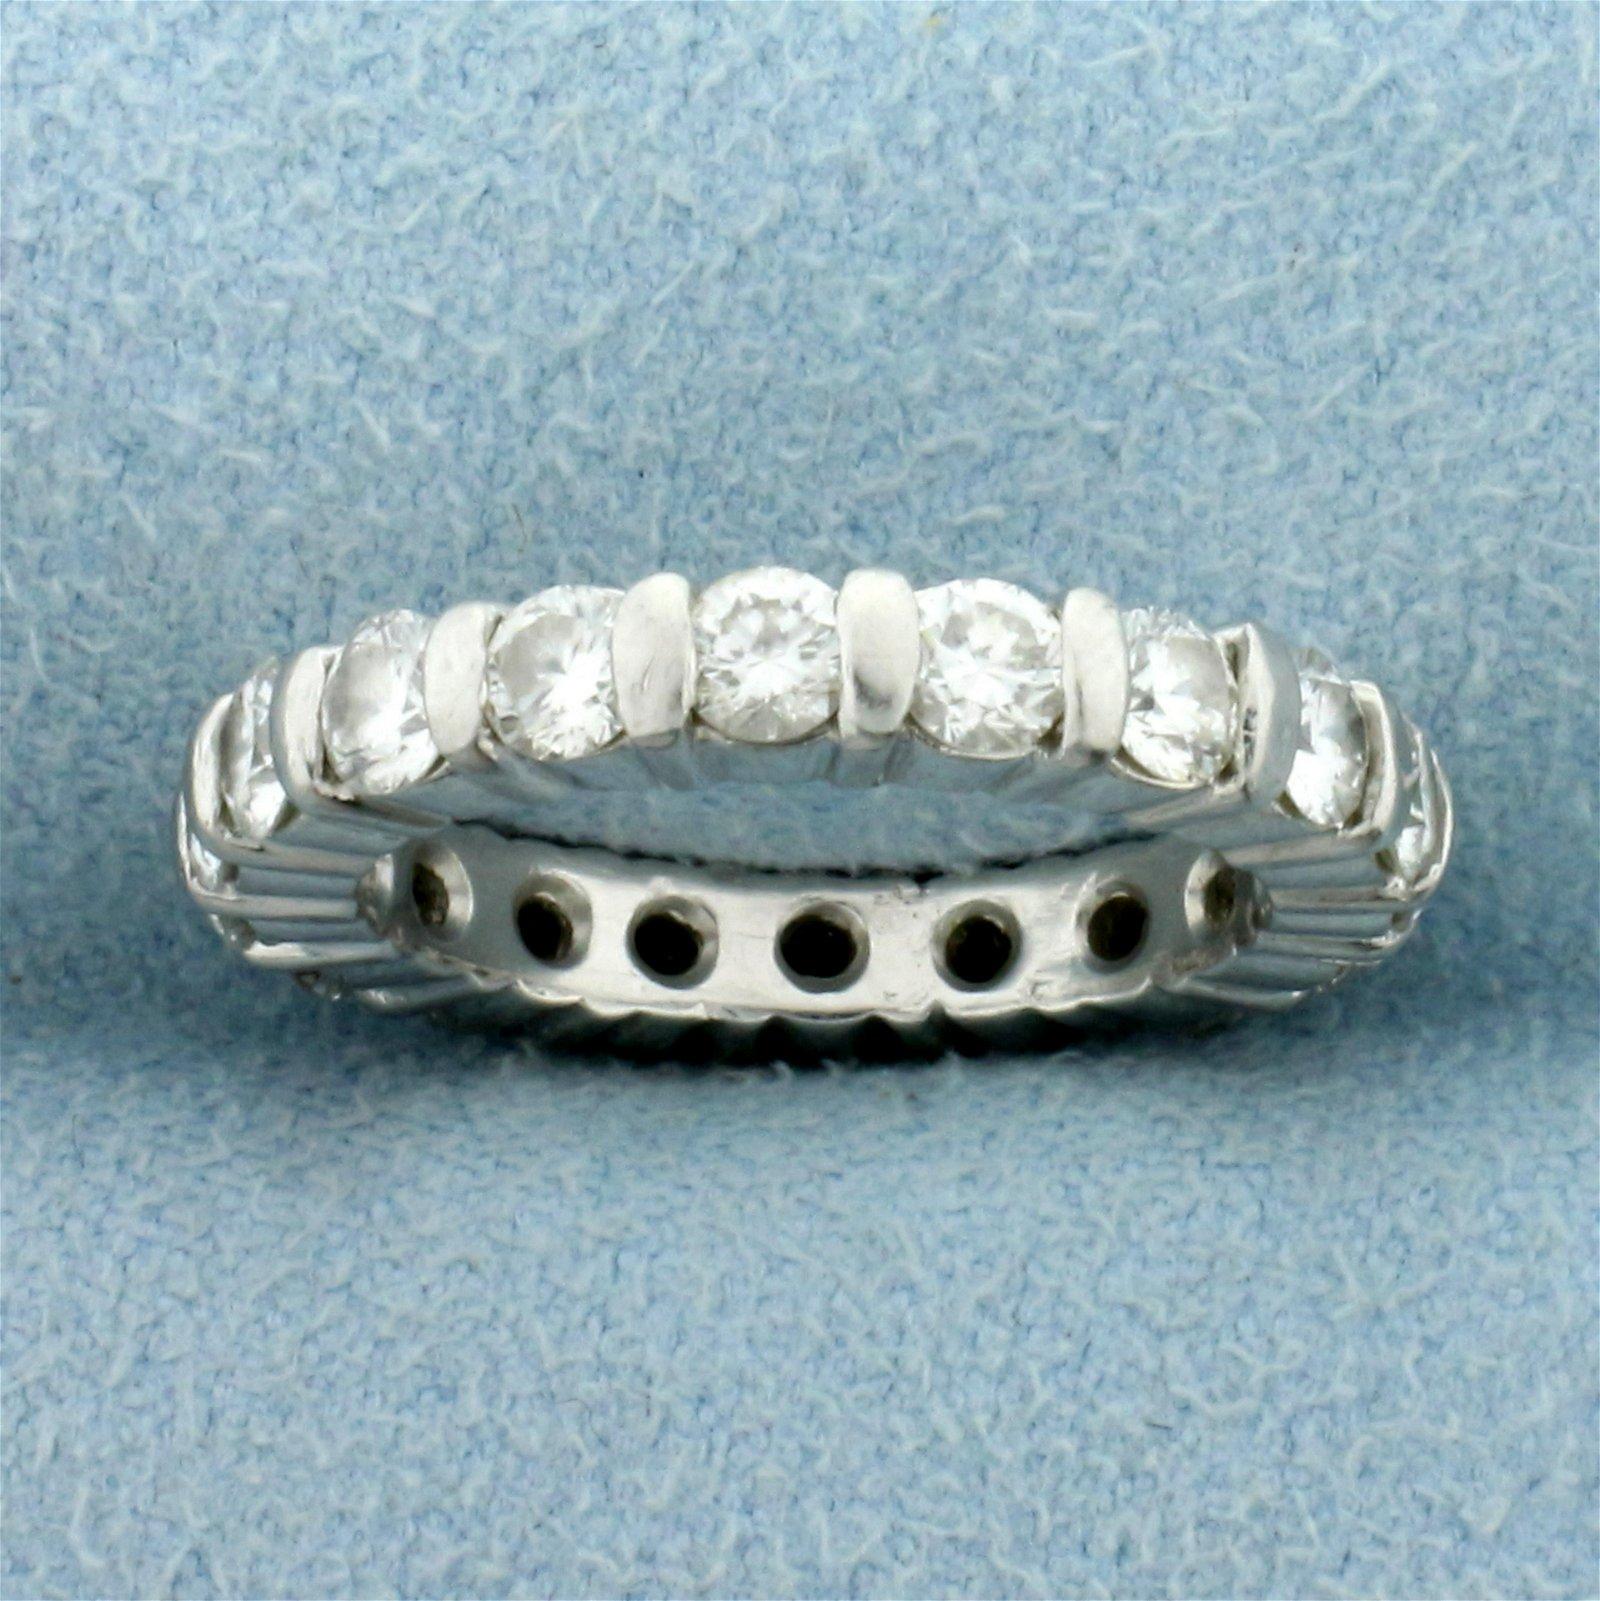 1.8ct TW Diamond Eternity Band Ring in Platinum